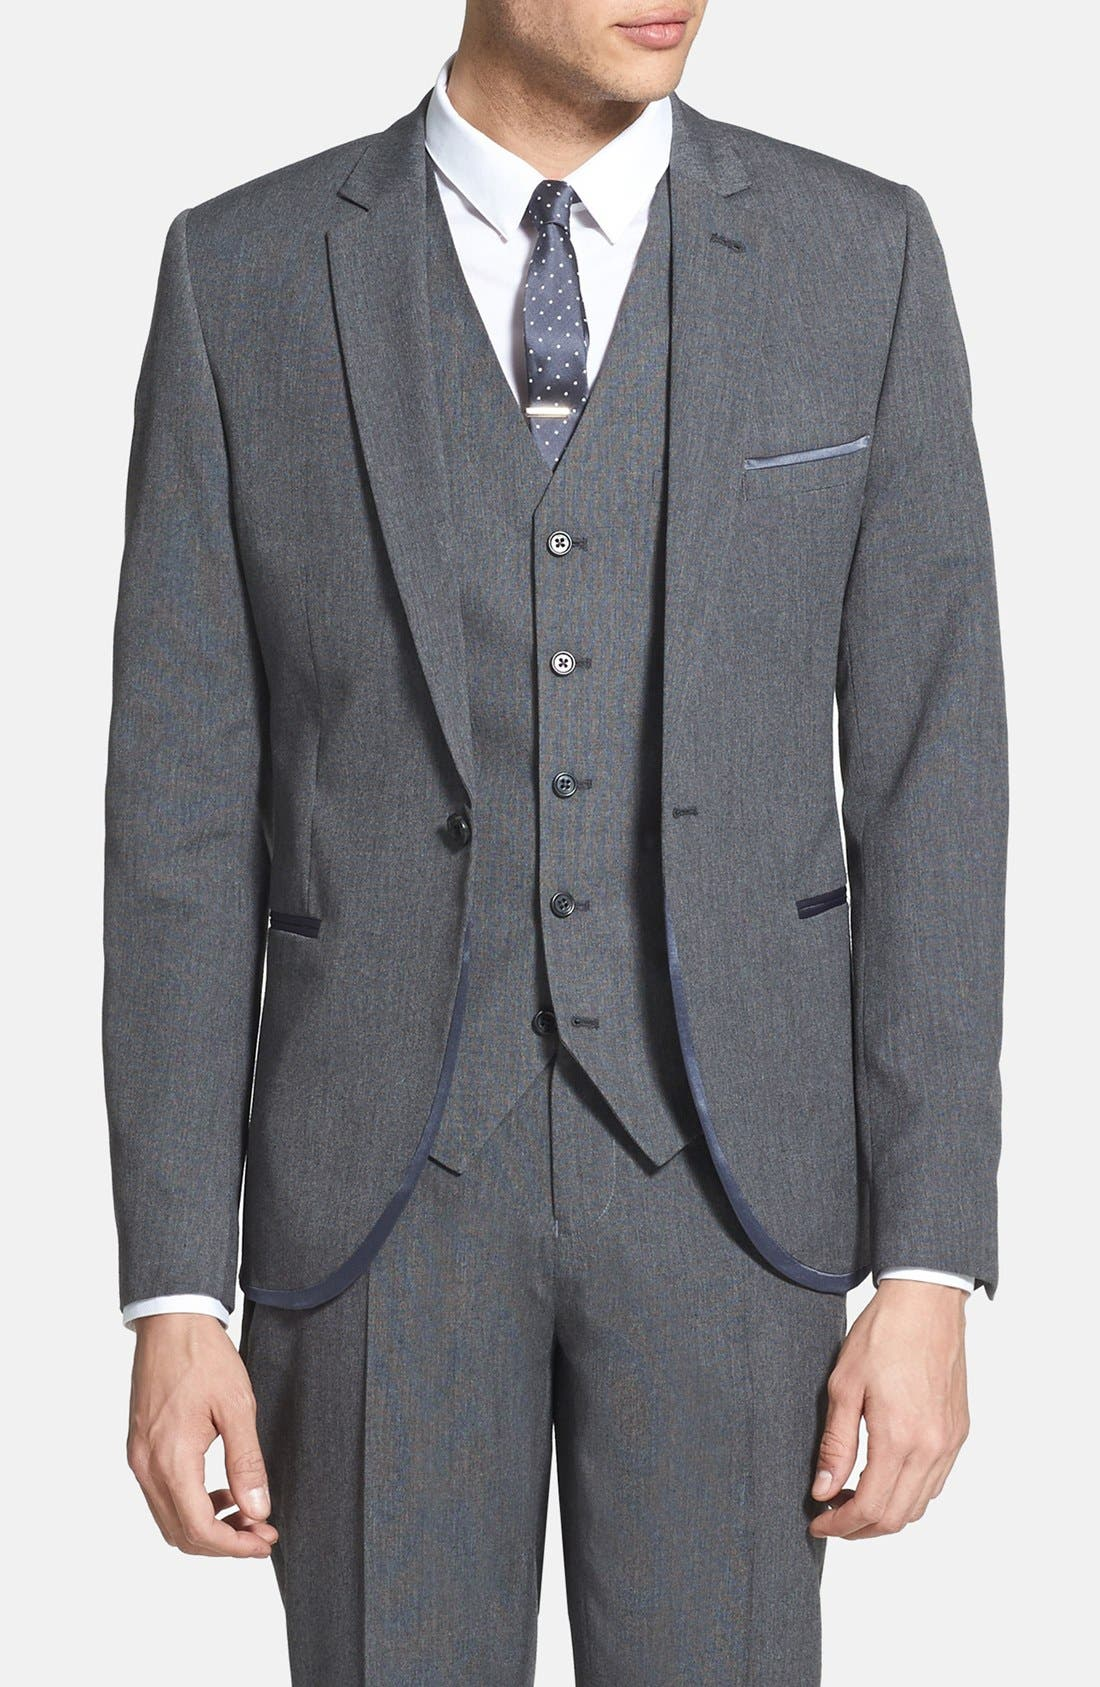 Alternate Image 1 Selected - Topman Skinny Fit Satin Trim Grey Suit Jacket